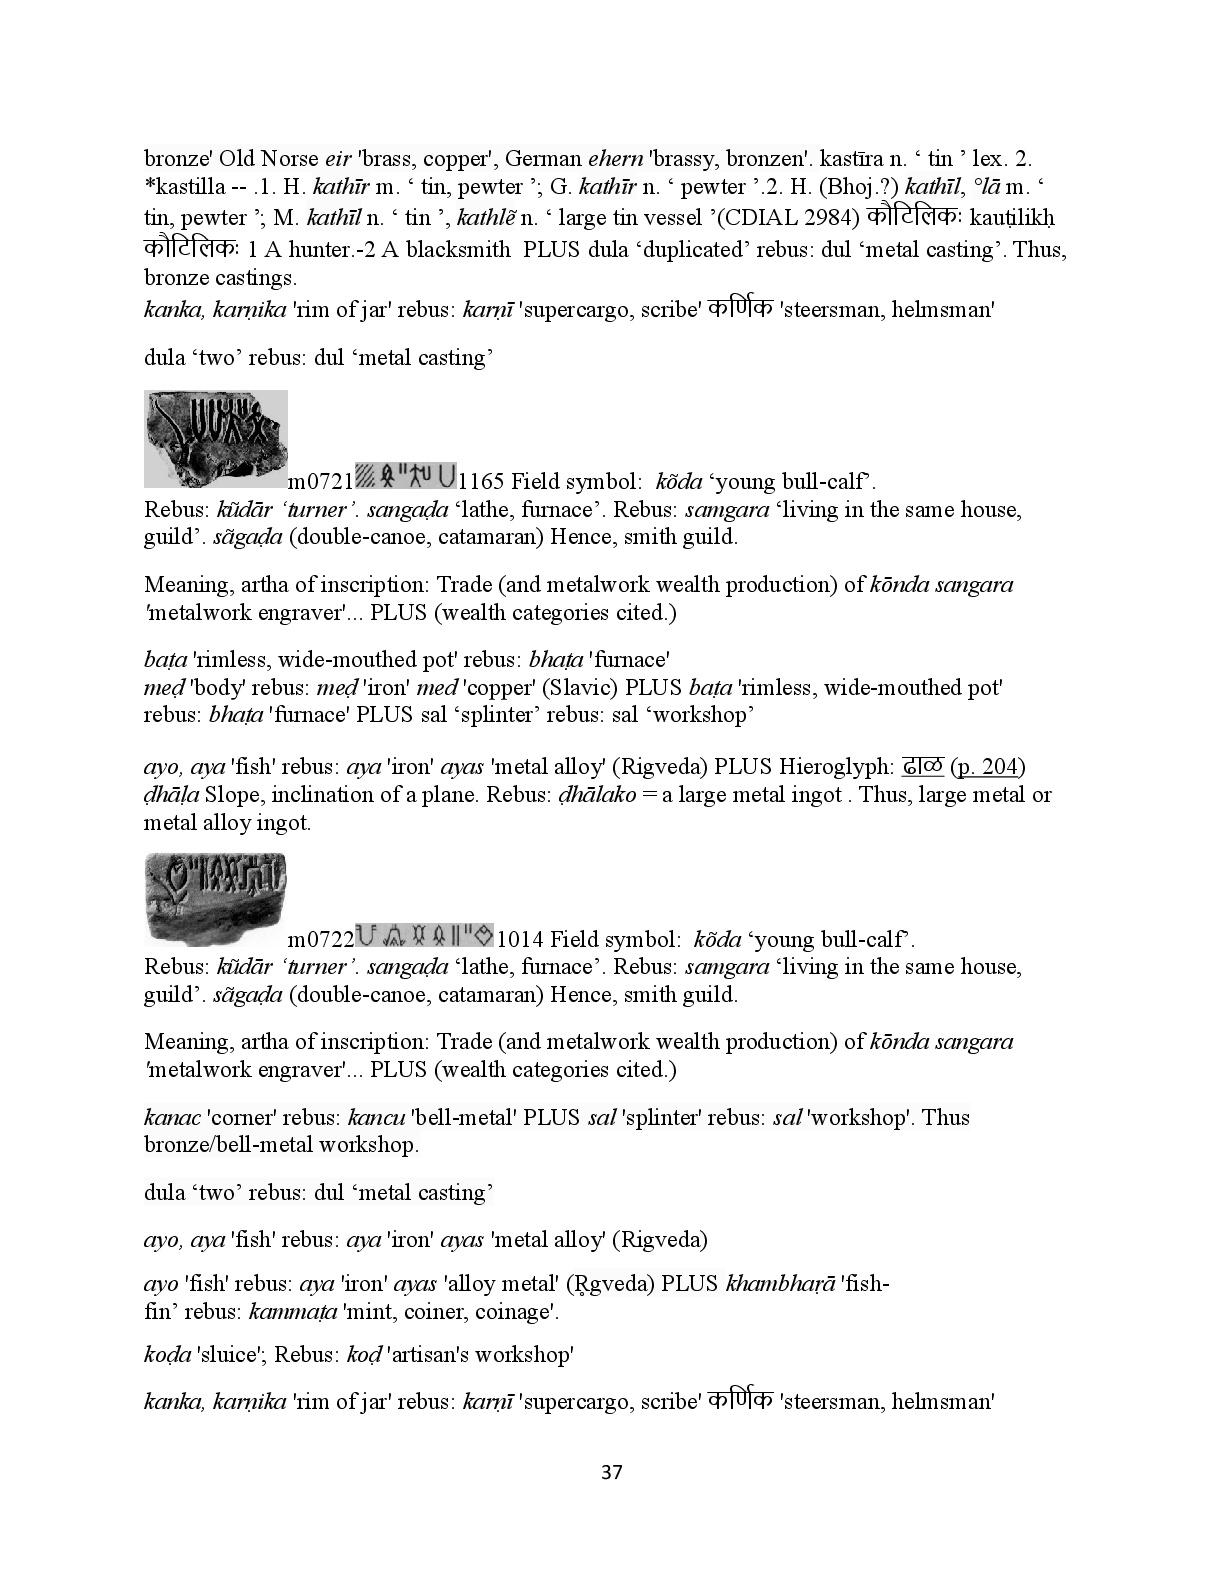 Set 18 mohenjo daro inscriptions vkyapadya m627 to m873 read ontpstinyurly996jmo6 biocorpaavc